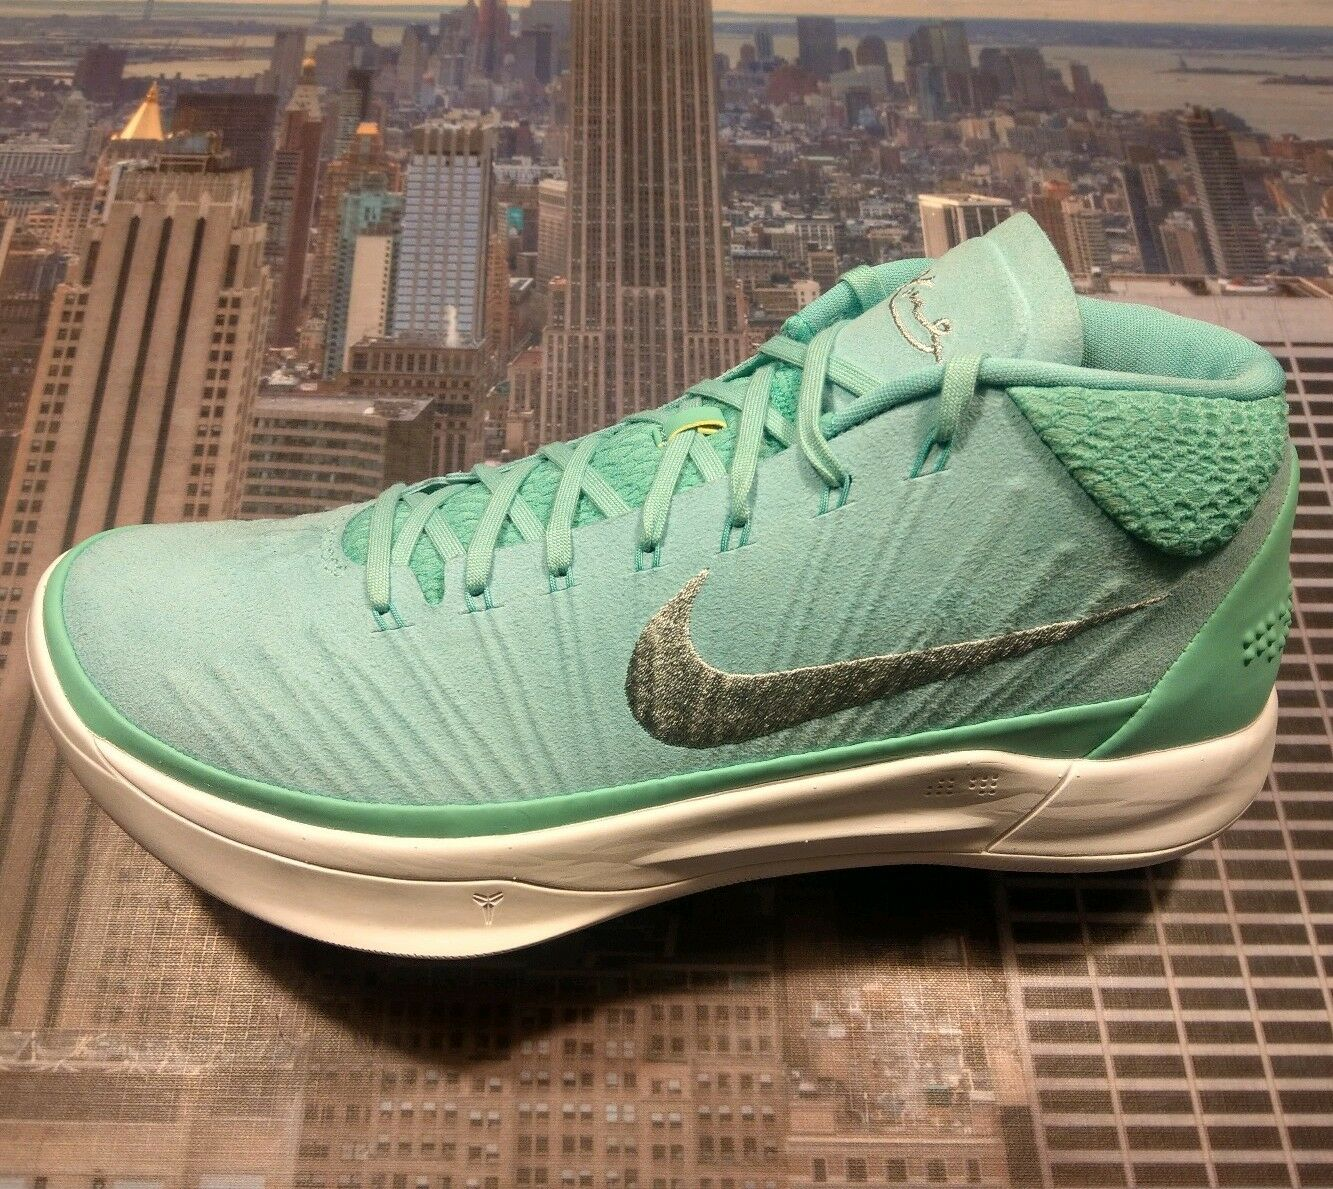 Nike Kobe AD A.D. TB Promo Unreleased Mint Mint Mint Silver-White Size 8.5 942521 305 New 86c076